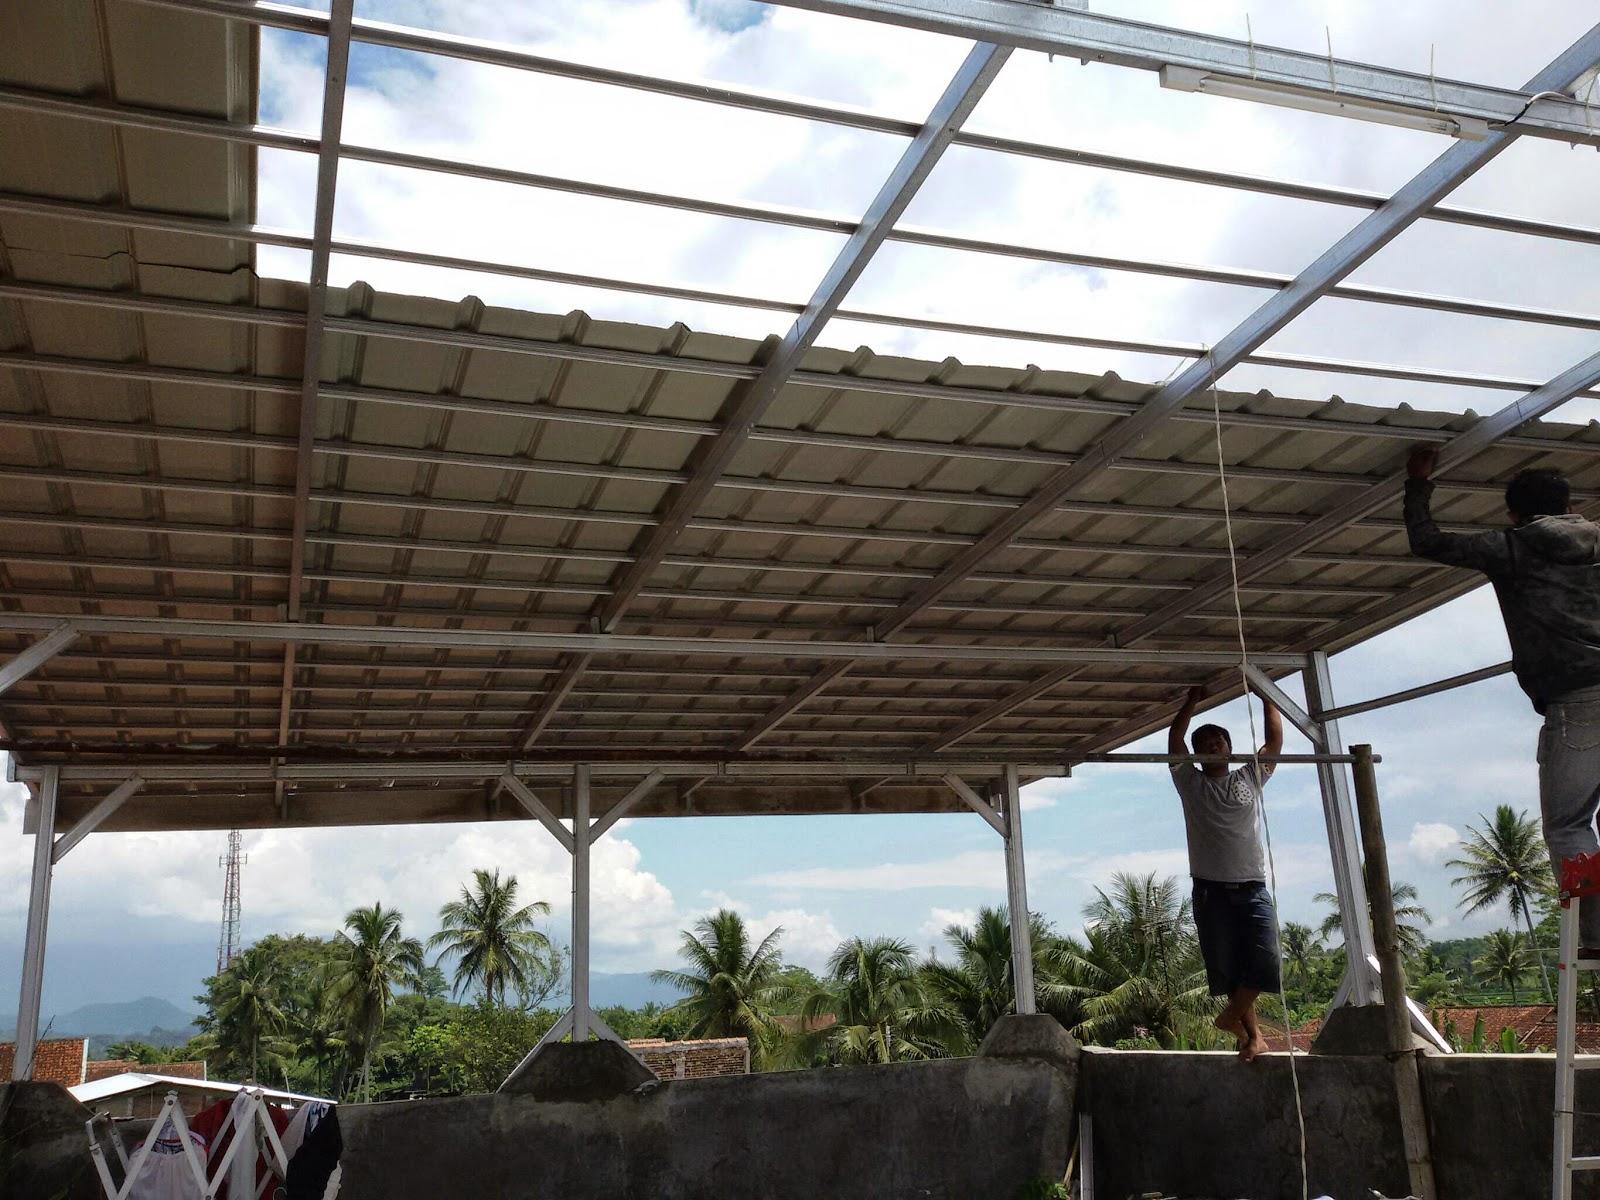 kanopi baja ringan cibitung tukang bajaringan tangerang canopy murah di